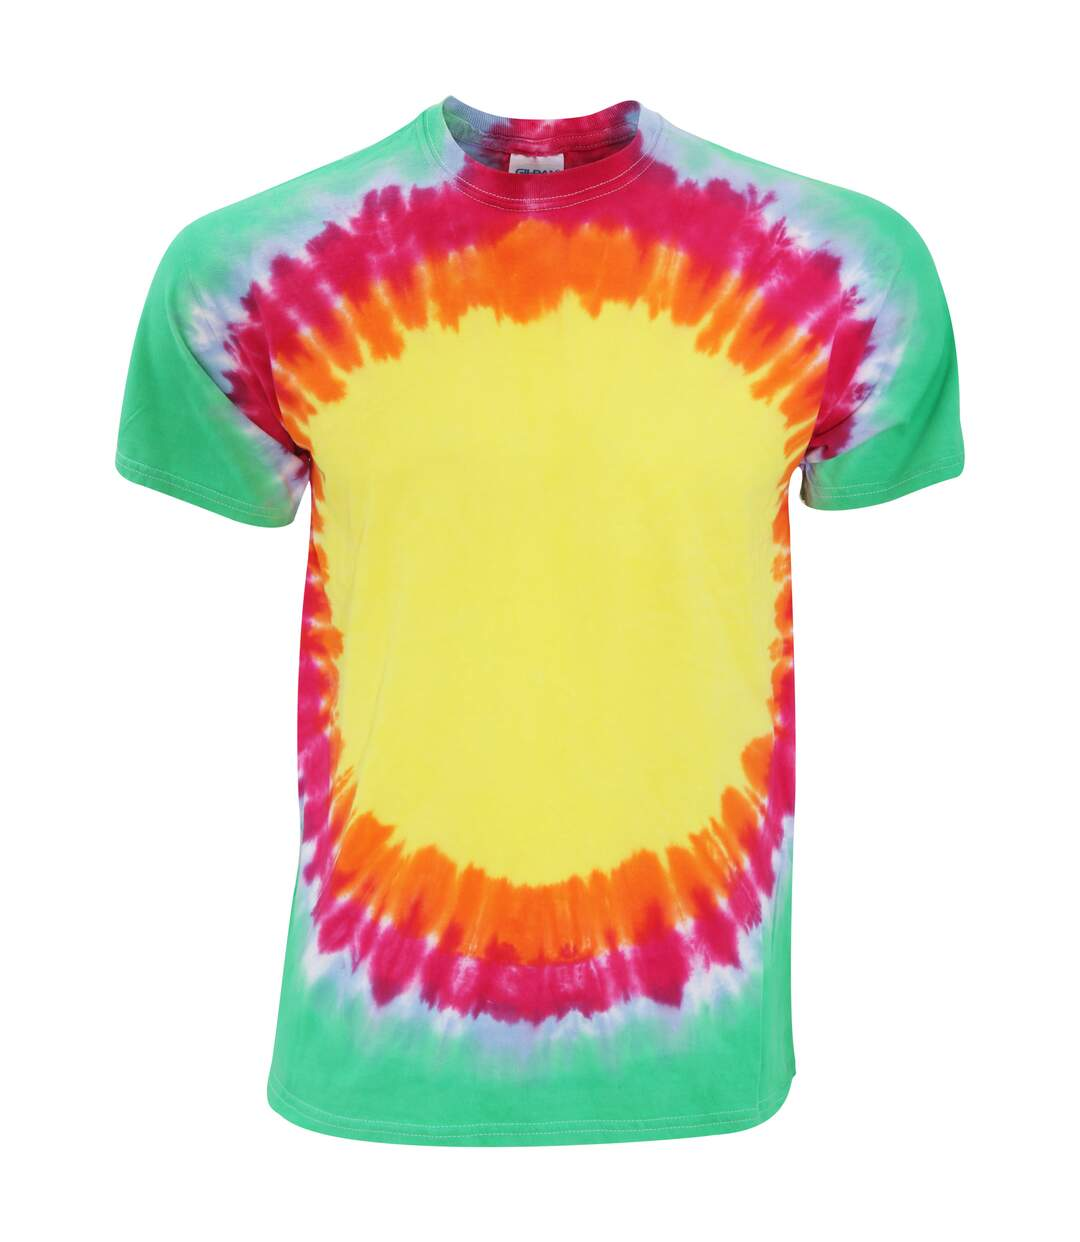 Colortone Adult Unisex Heavyweight Rainbow Sunburst T-Shirt (Rainbow Sunburst) - UTRW2633